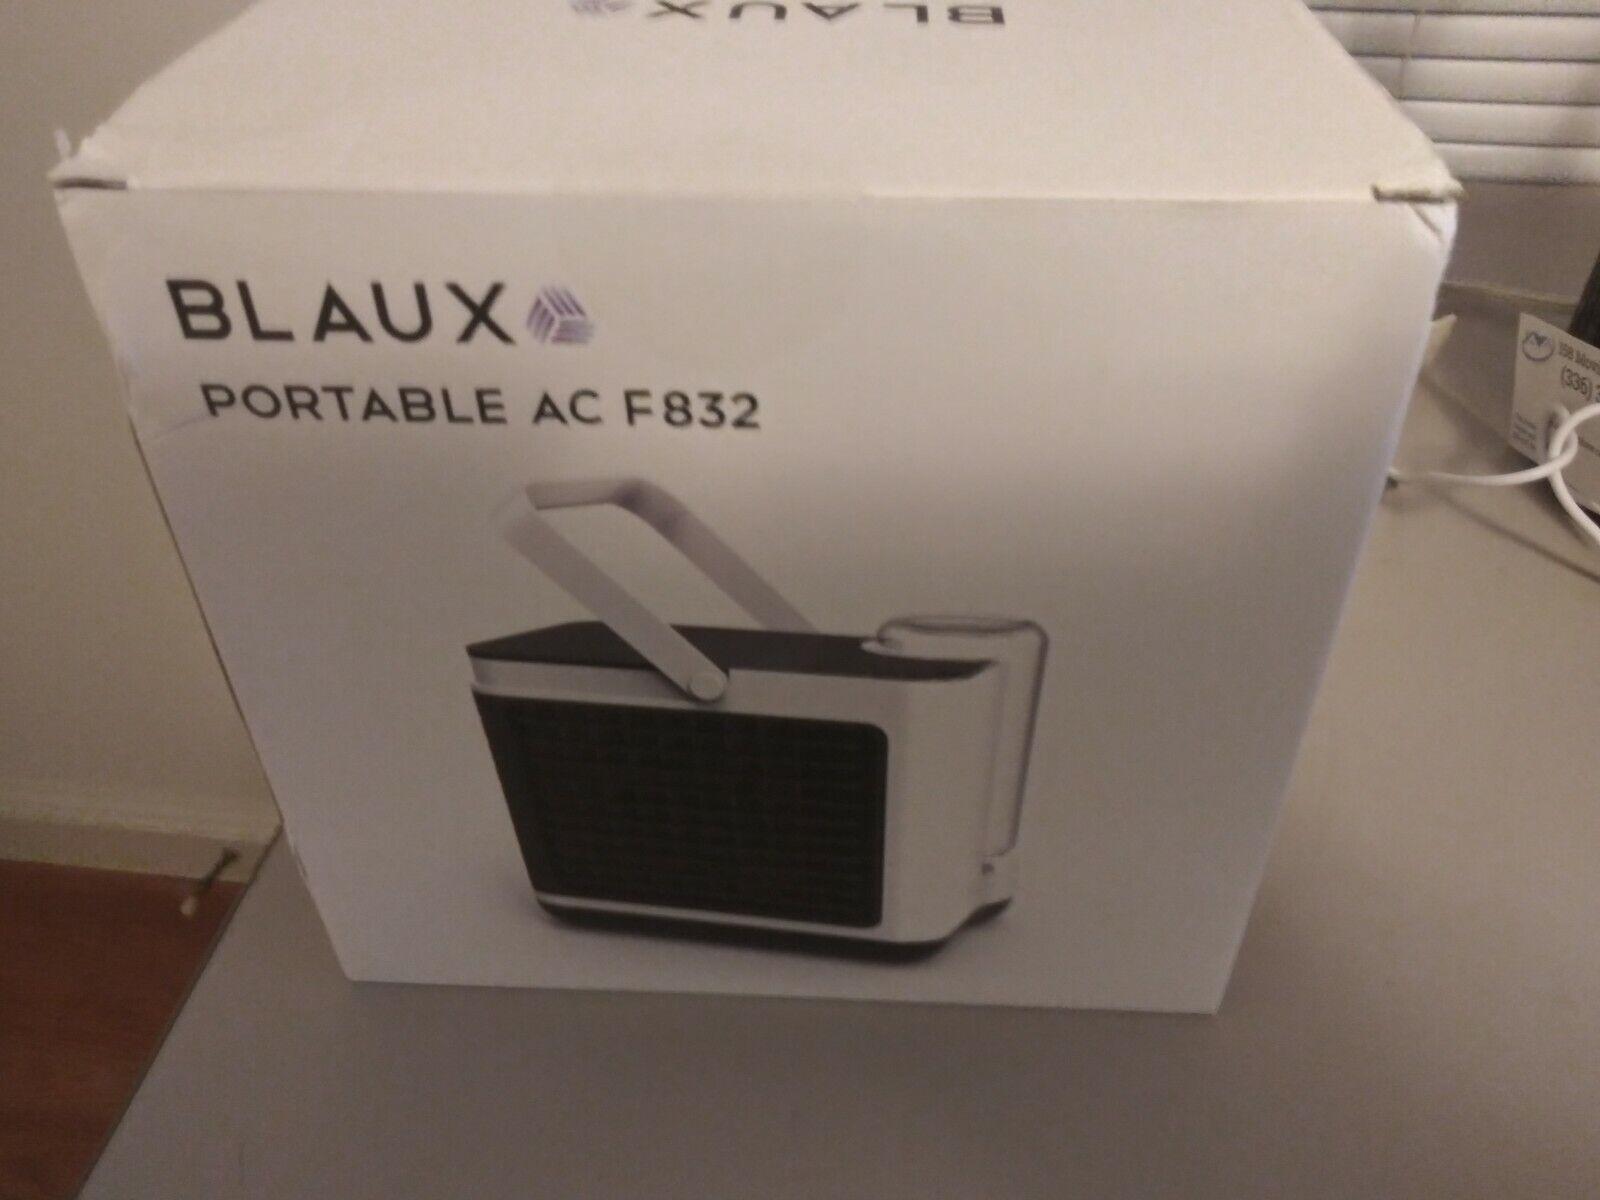 Blaux Portable Air Conditioner AC F832 Brand New